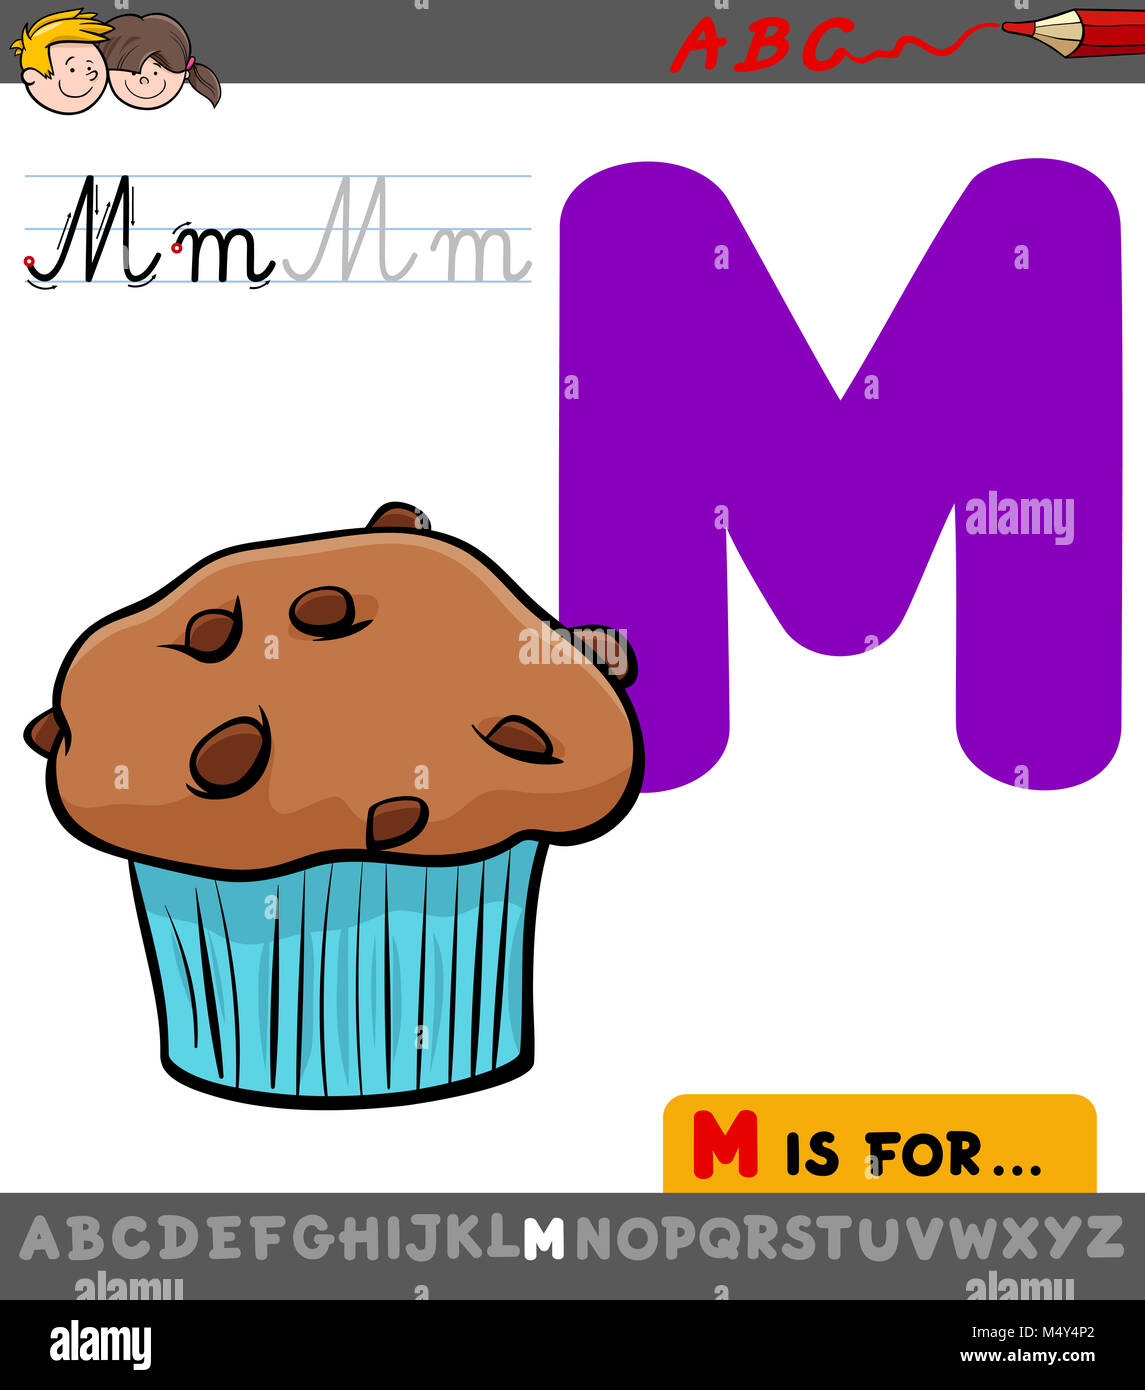 Cartoon Letter M Stockfotos & Cartoon Letter M Bilder - Alamy